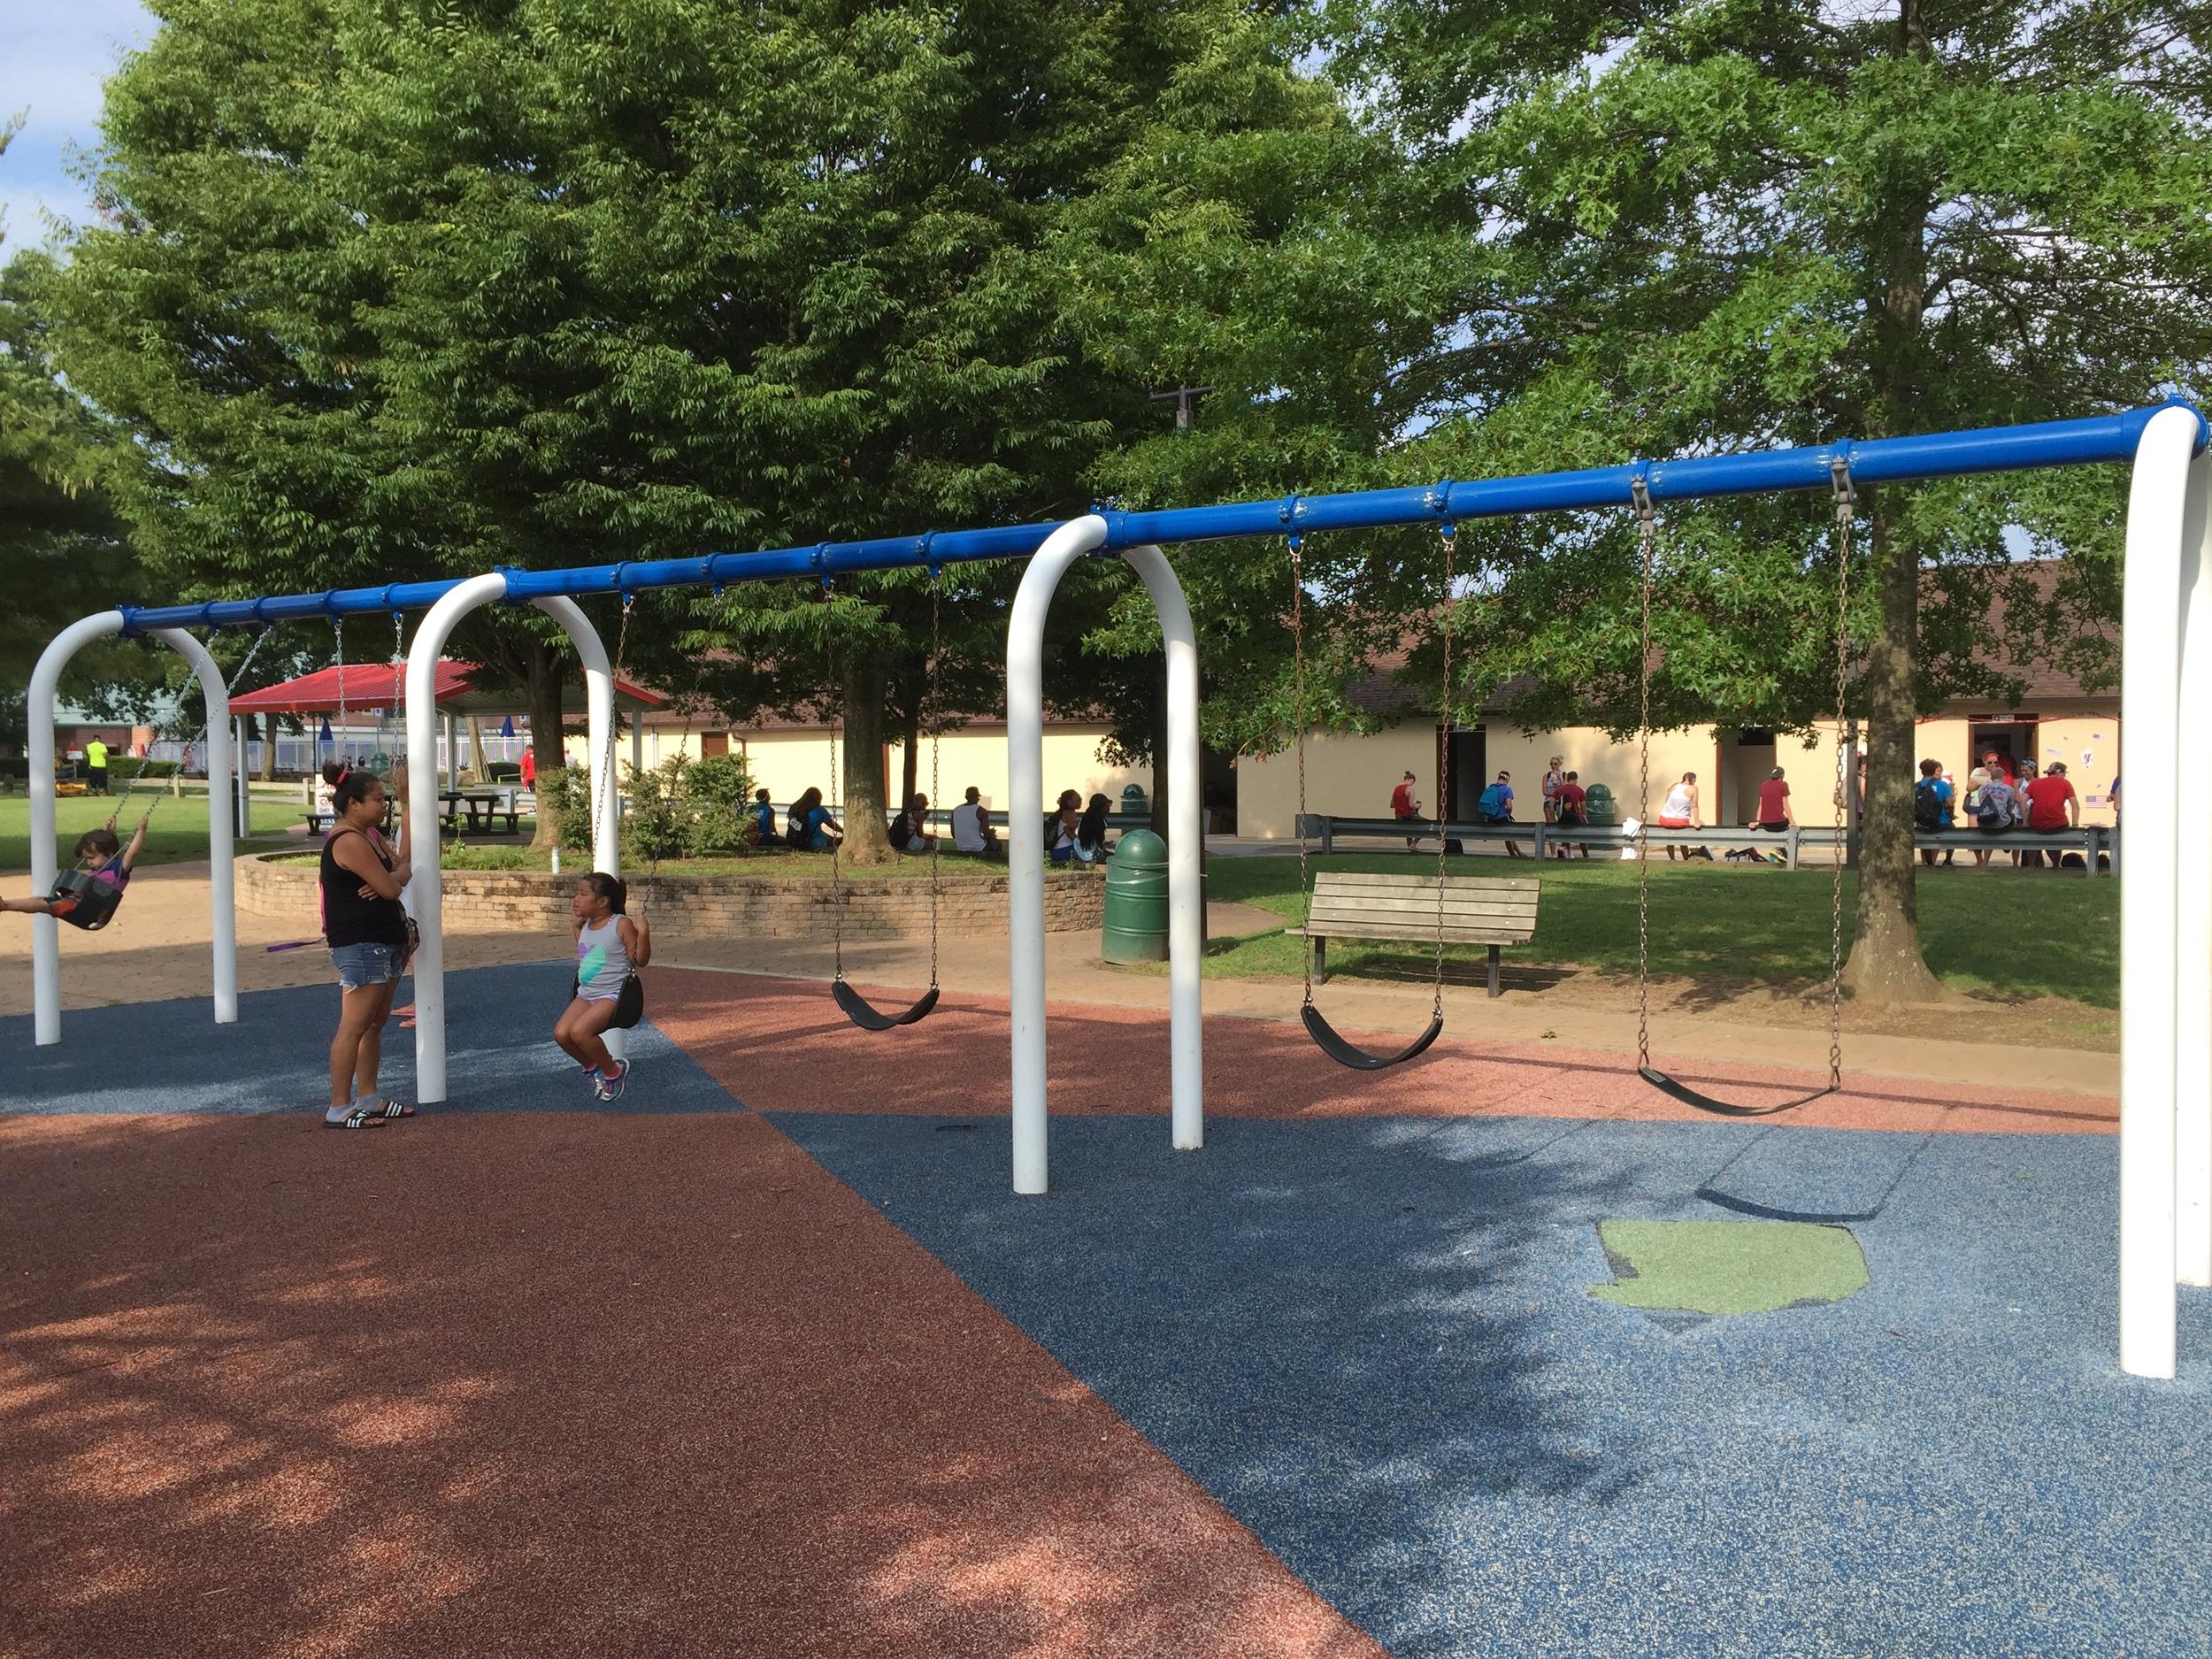 Swings at Phelps Lane Park